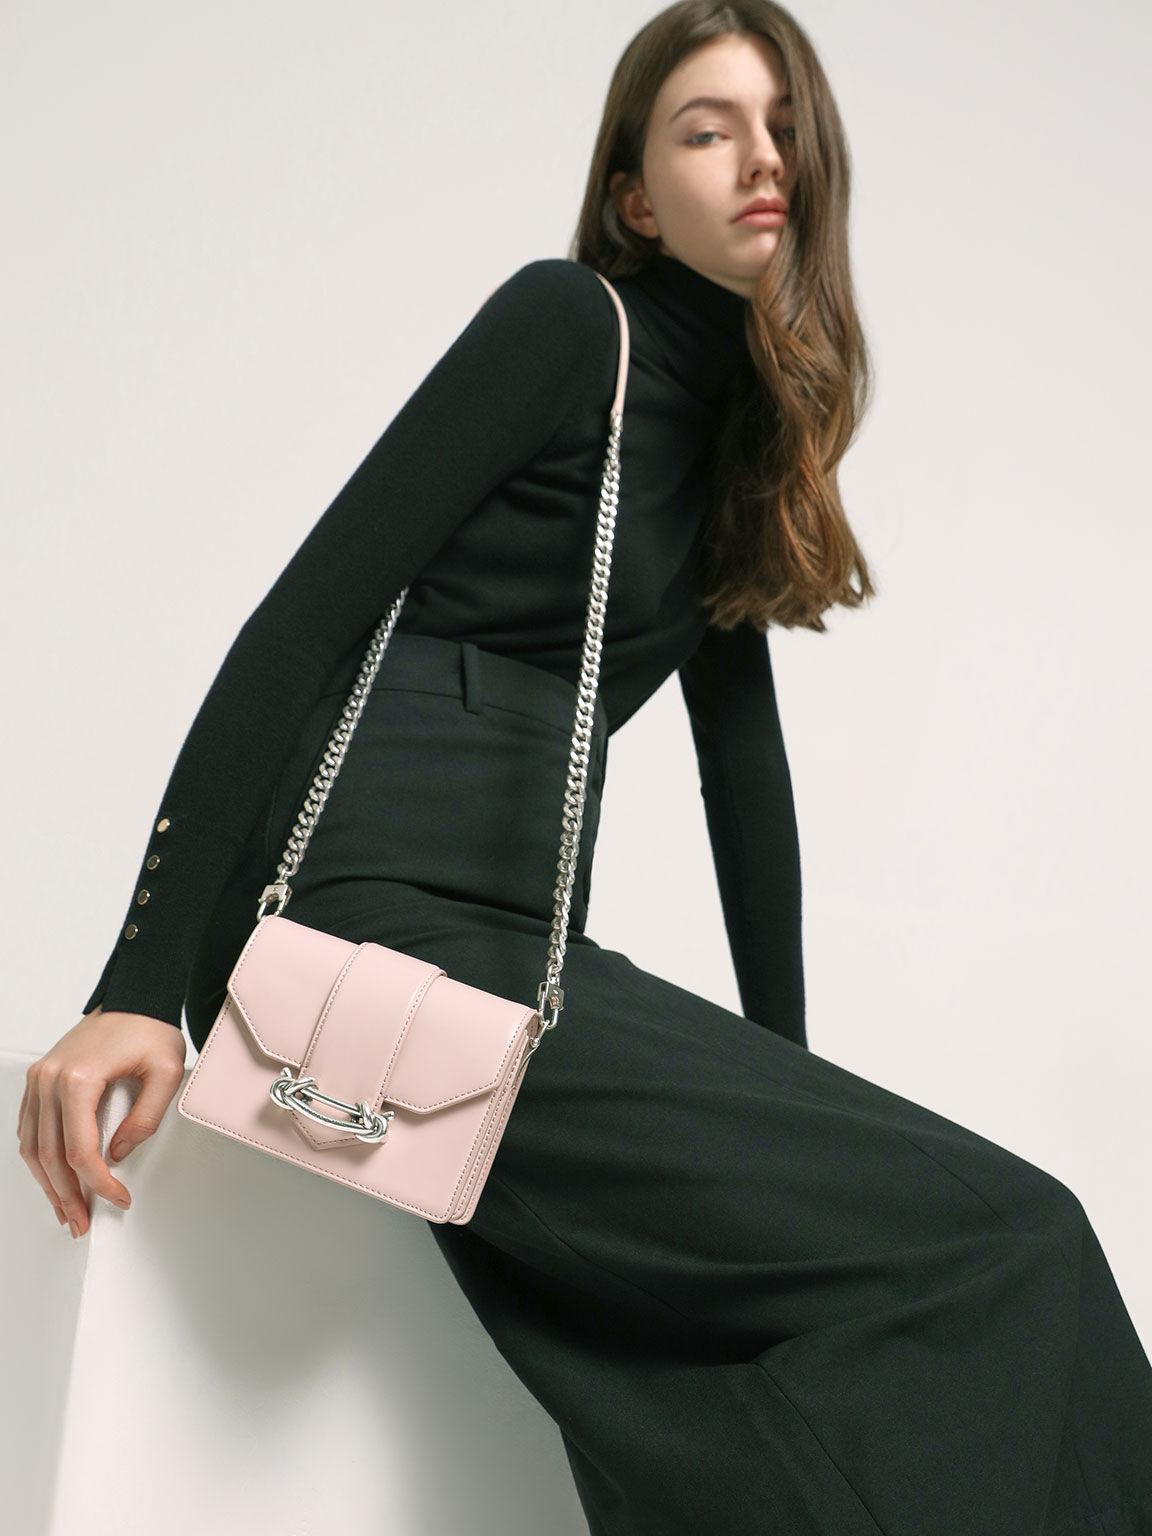 Metallic Buckle Crossbody Bag, Light Pink, hi-res